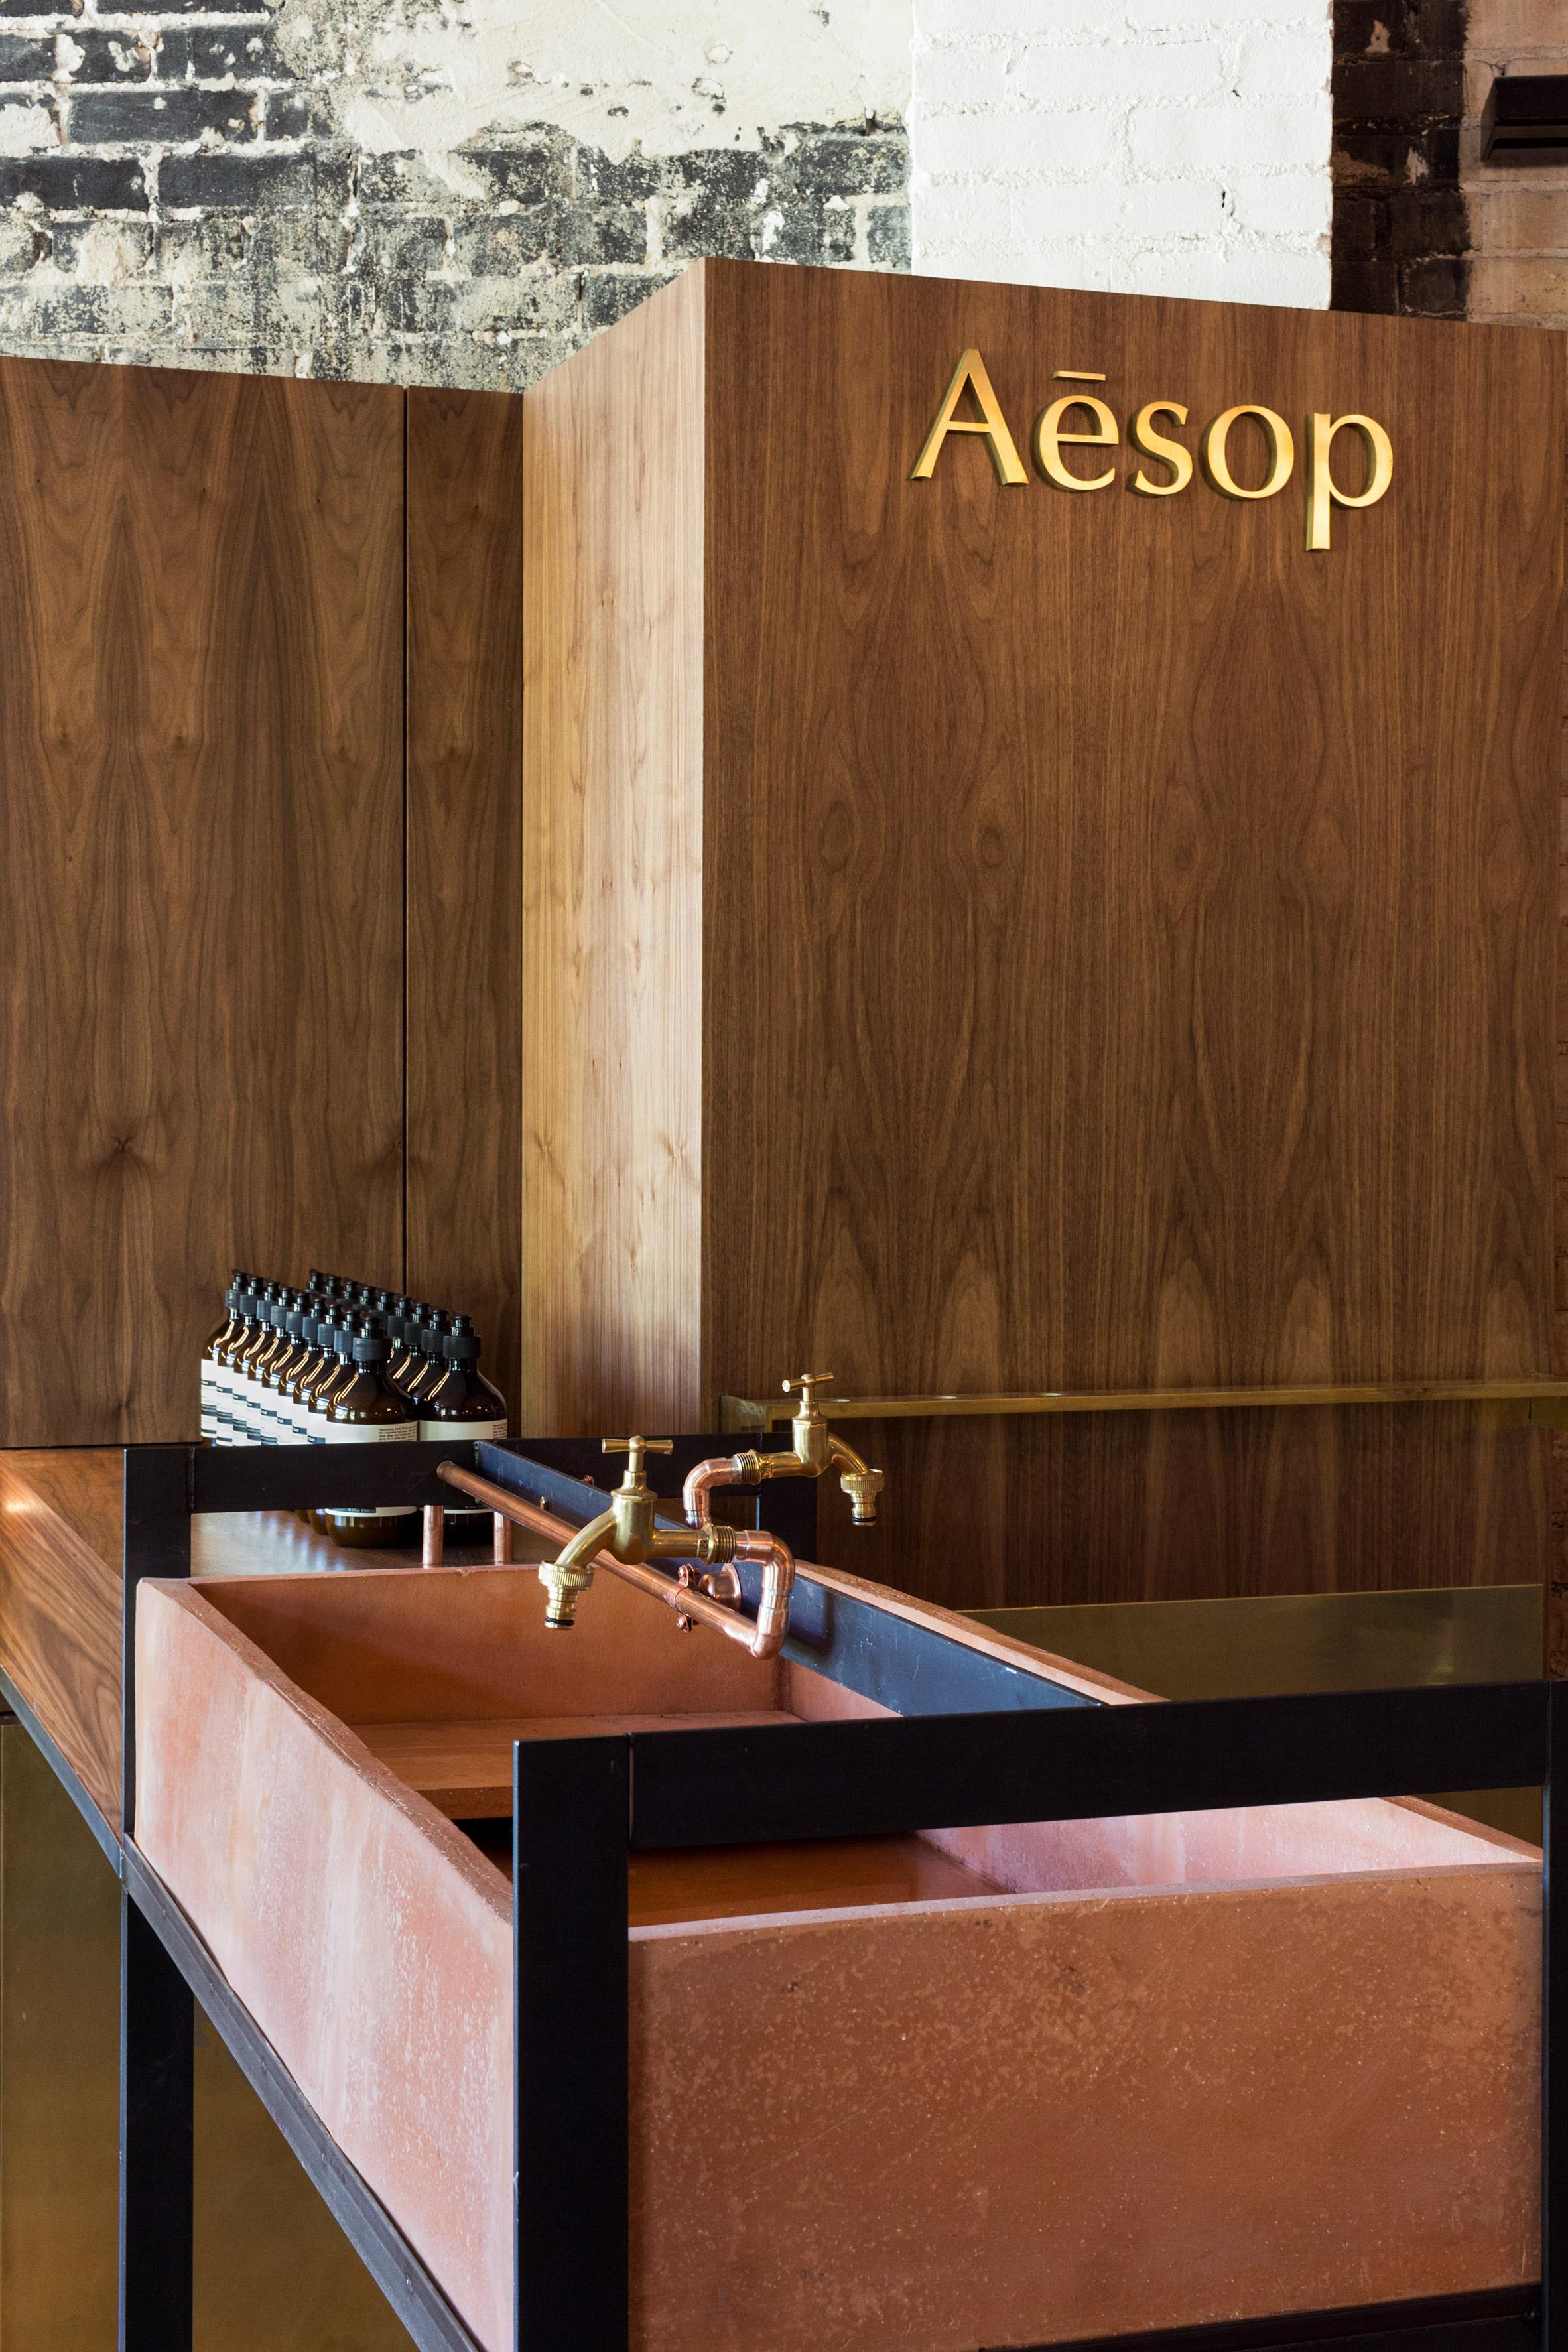 Aesop store in Florida. Interior design by Mexican architect Frida Escobedo.